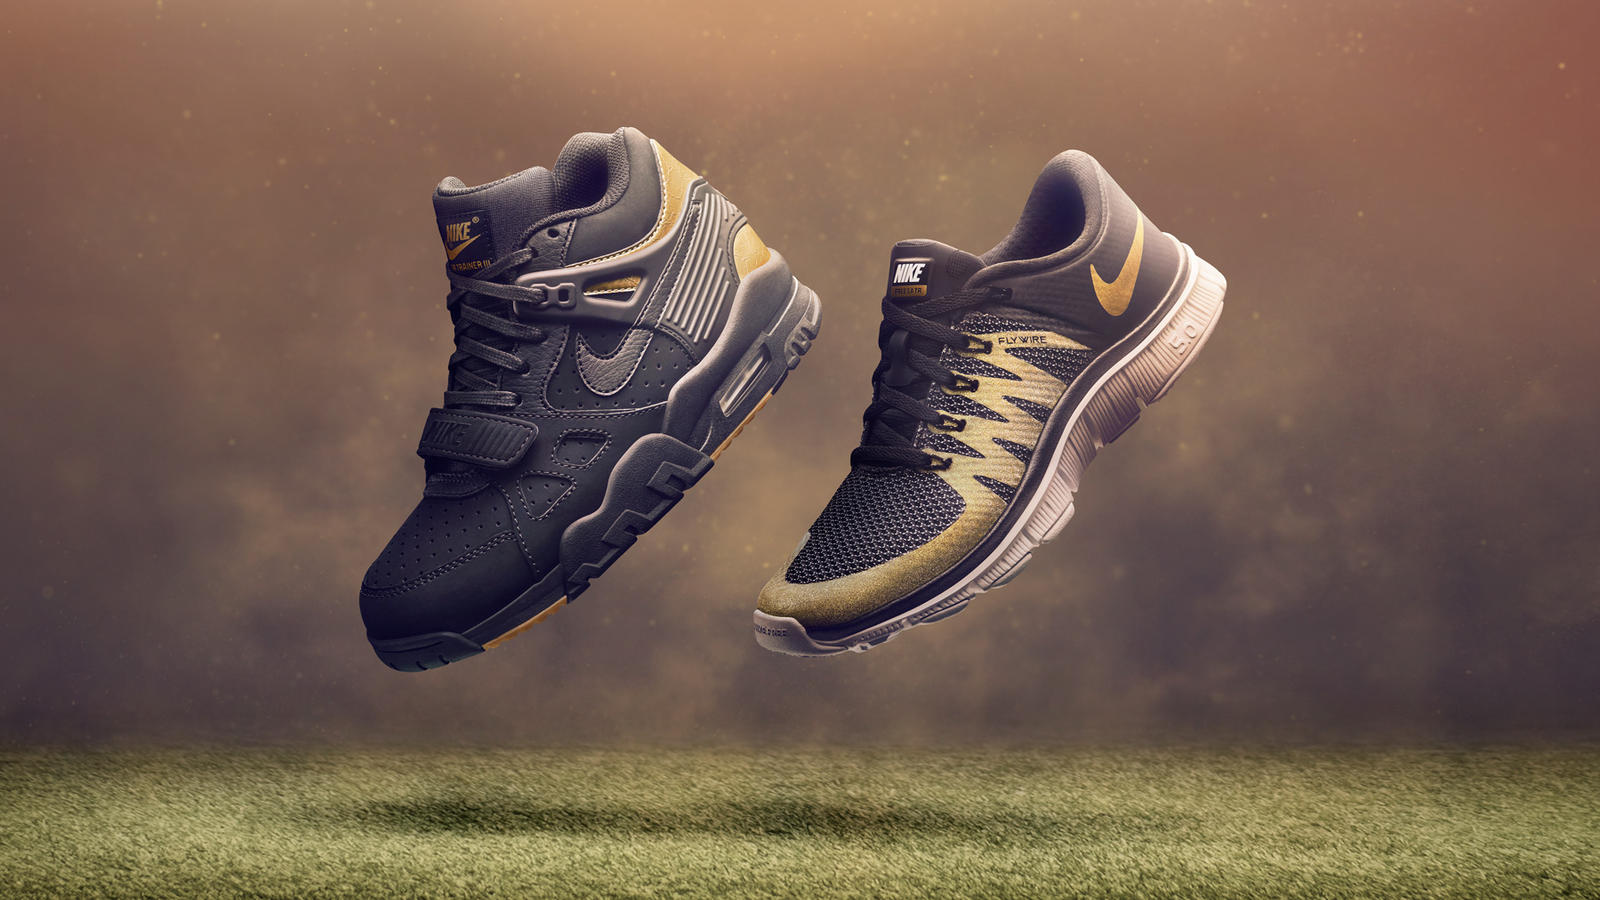 SP16_YA_NA_SB50_Multiple_Footwear_01